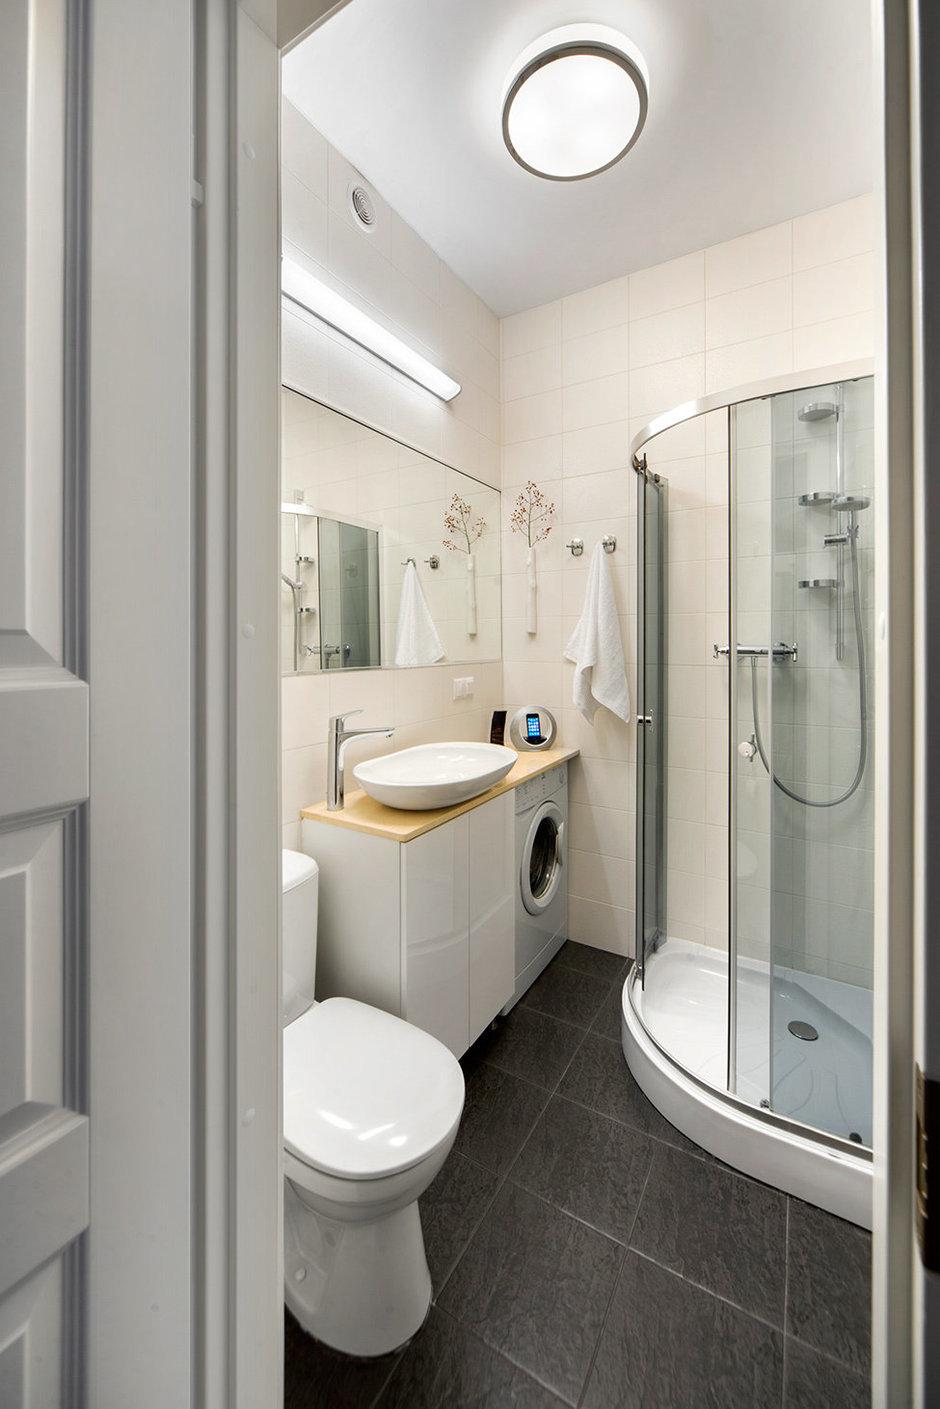 Фотография: Ванная в стиле Современный, Малогабаритная квартира, Квартира, Дома и квартиры, IKEA, Проект недели, Хрущевка – фото на InMyRoom.ru